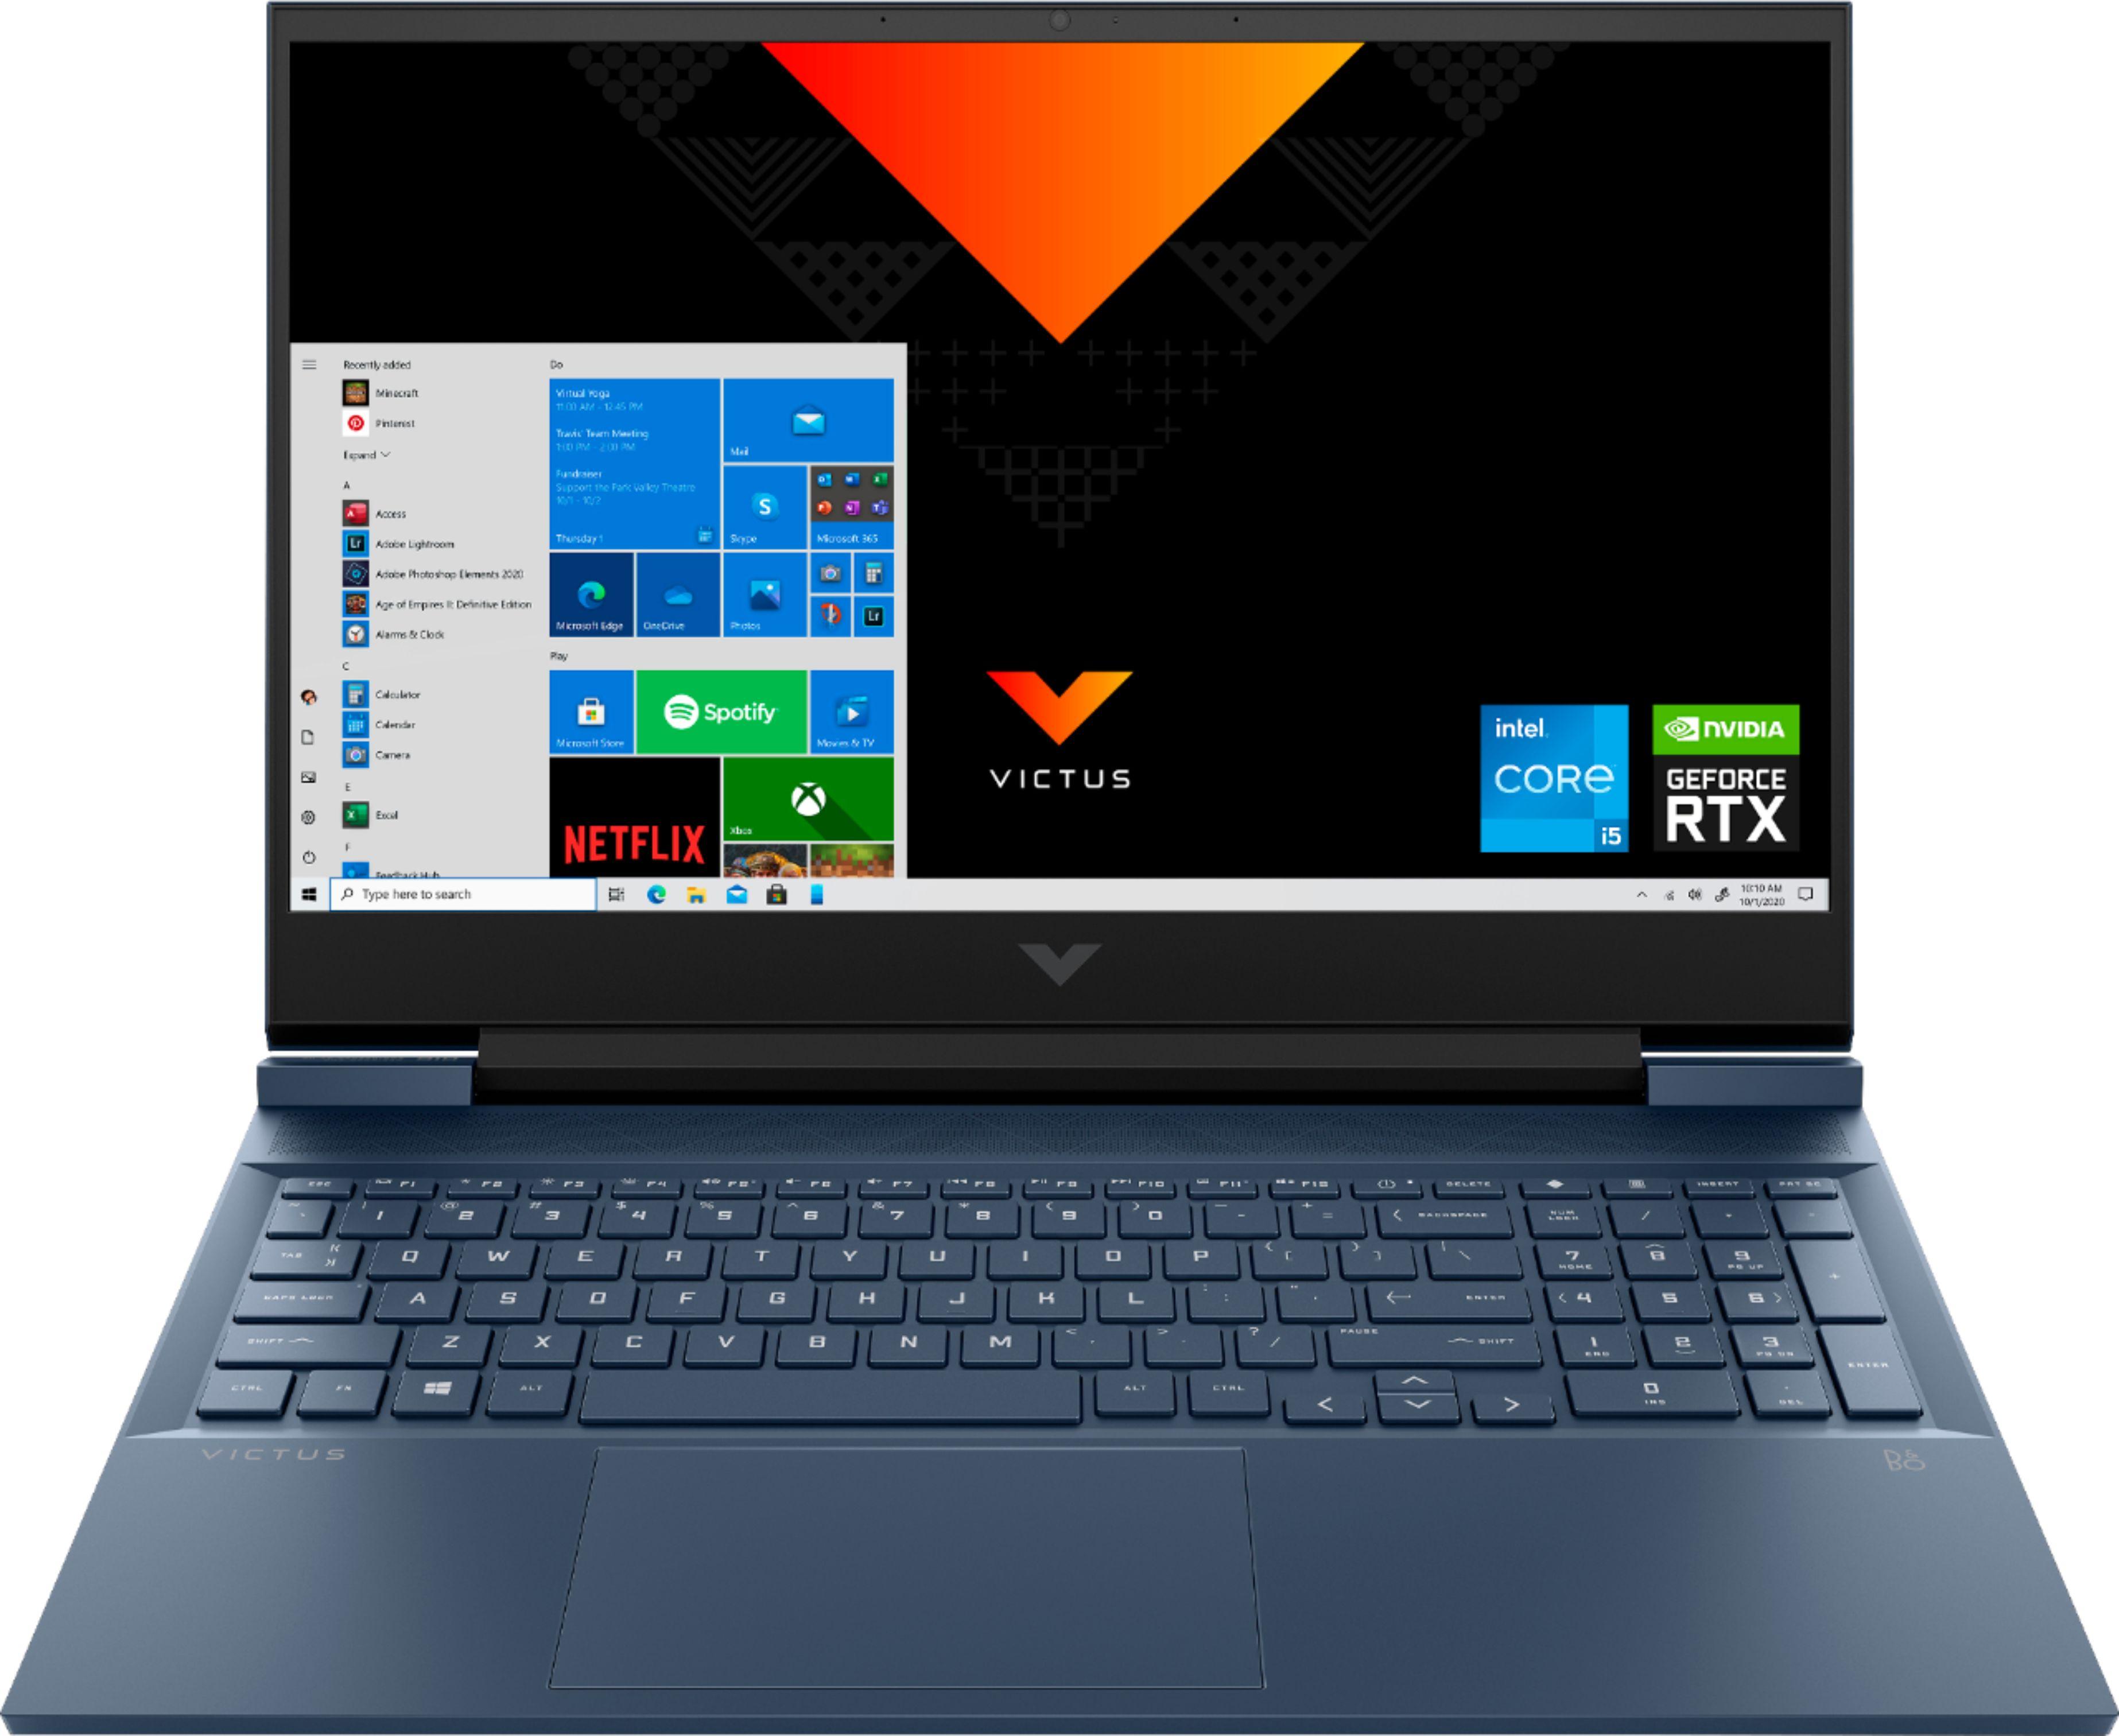 "HP - Victus 16.1"" Laptop - Intel Core i5 - 8GB Memory - NVIDIA GeForce RTX 3050 - 256GB SSD $799"